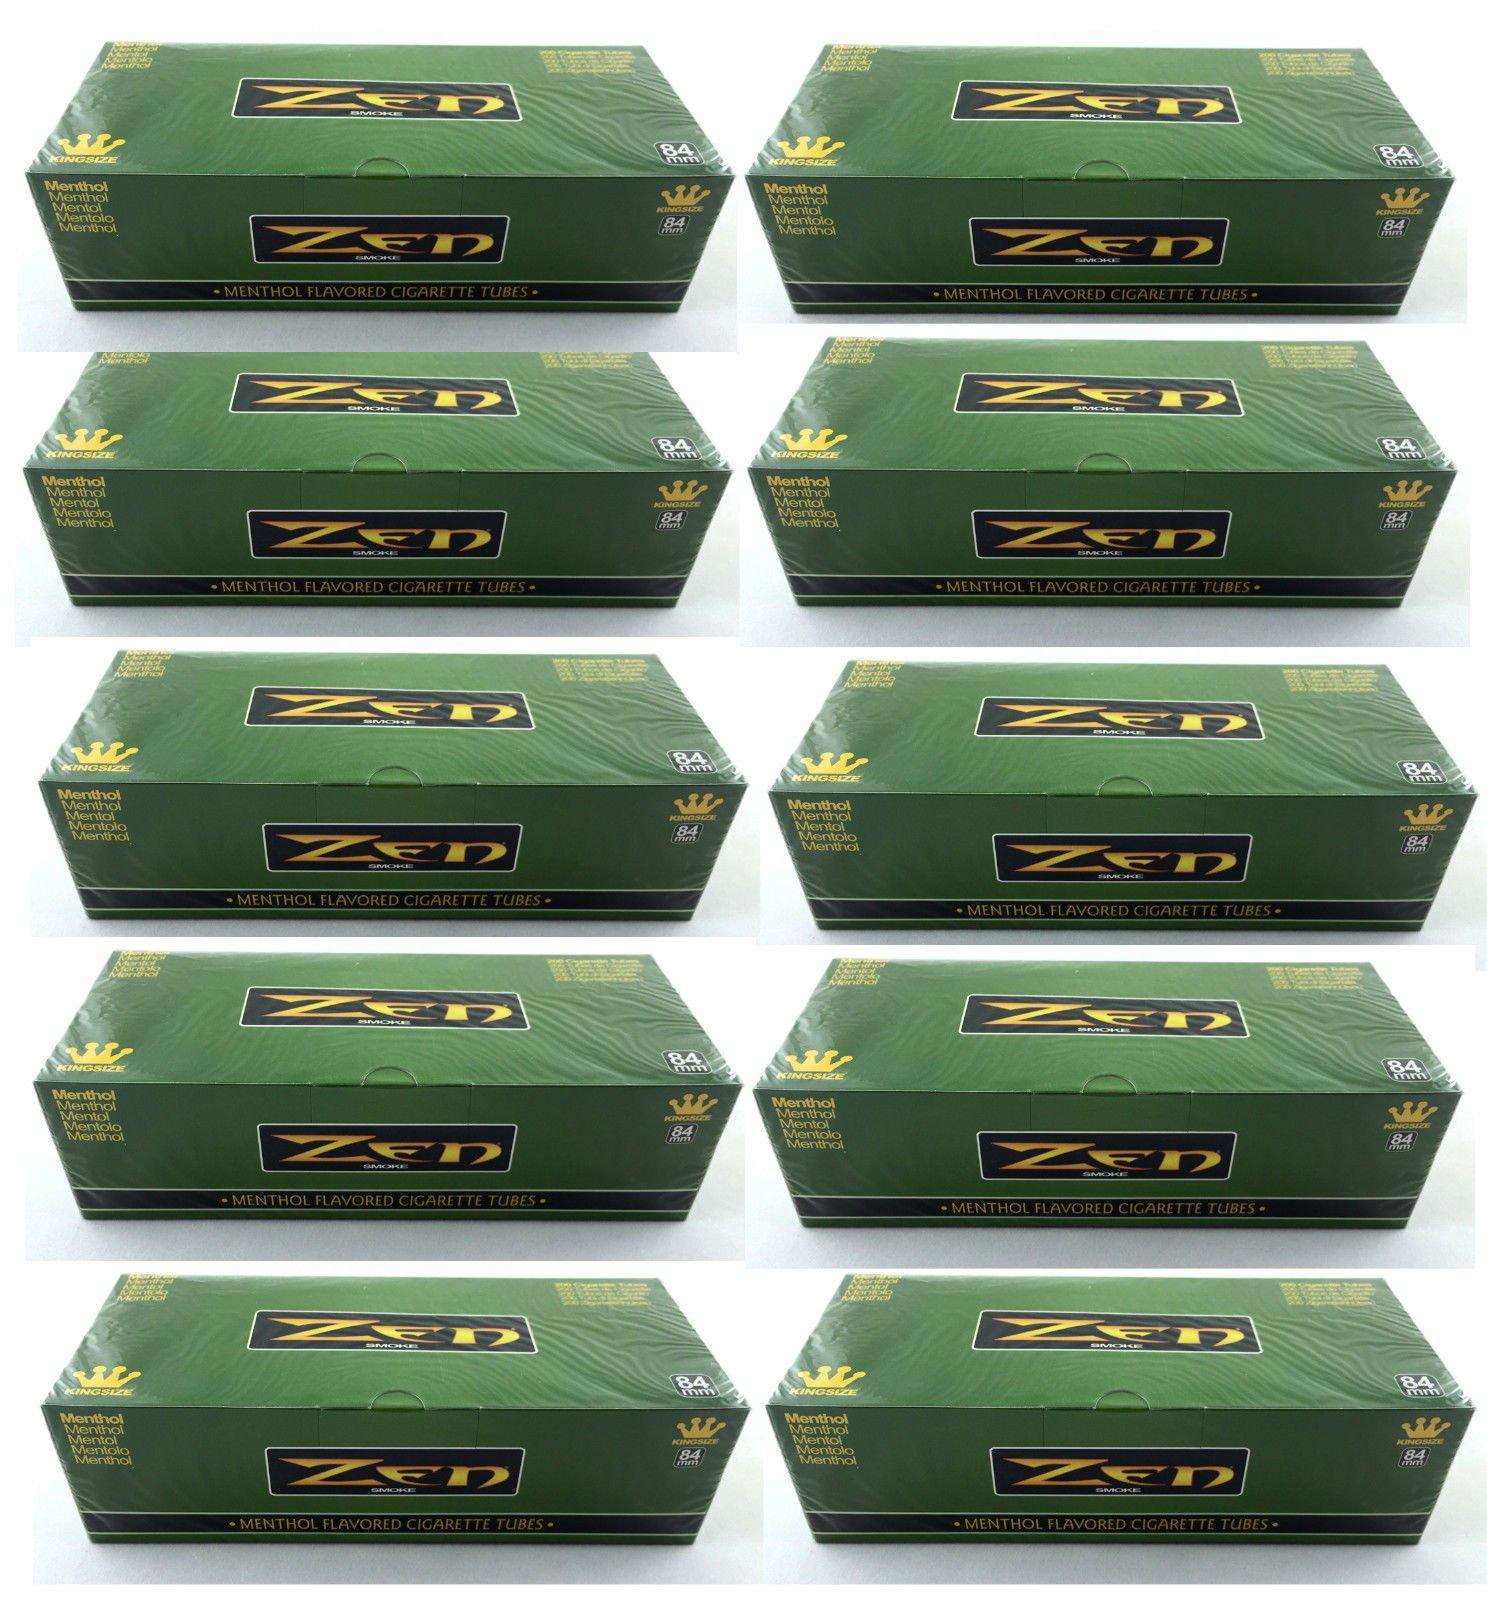 Zen Menthol King Size Cigarette Filter Tubes 200 Tubes per box (10)